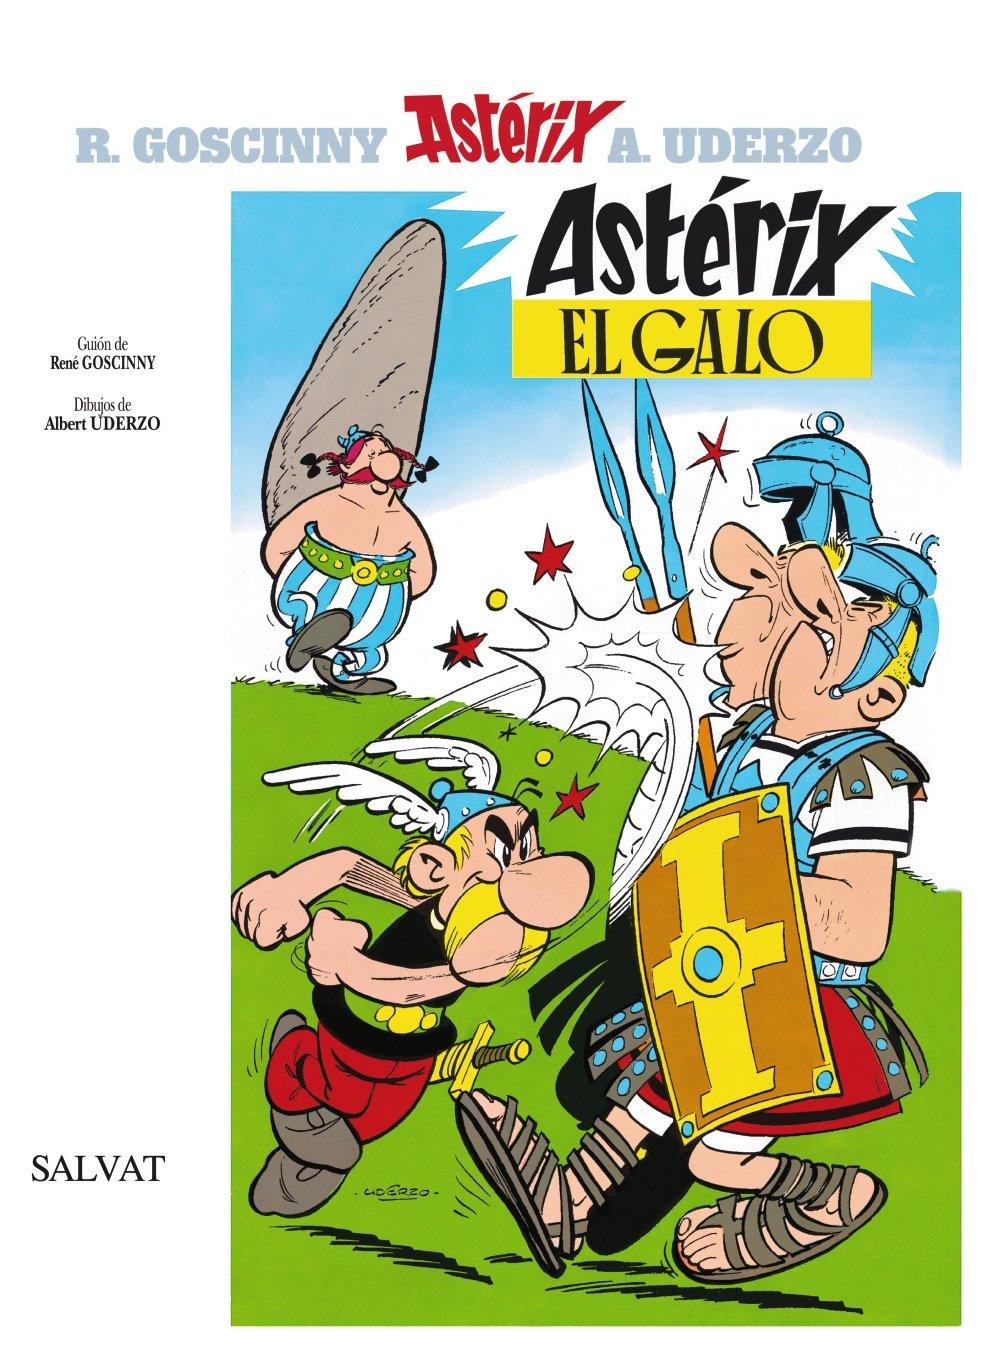 Astérix El Galo Castellano Salvat Comic Astérix Spanish Edition Uderzo Albert Goscinny René 9788434567191 Books